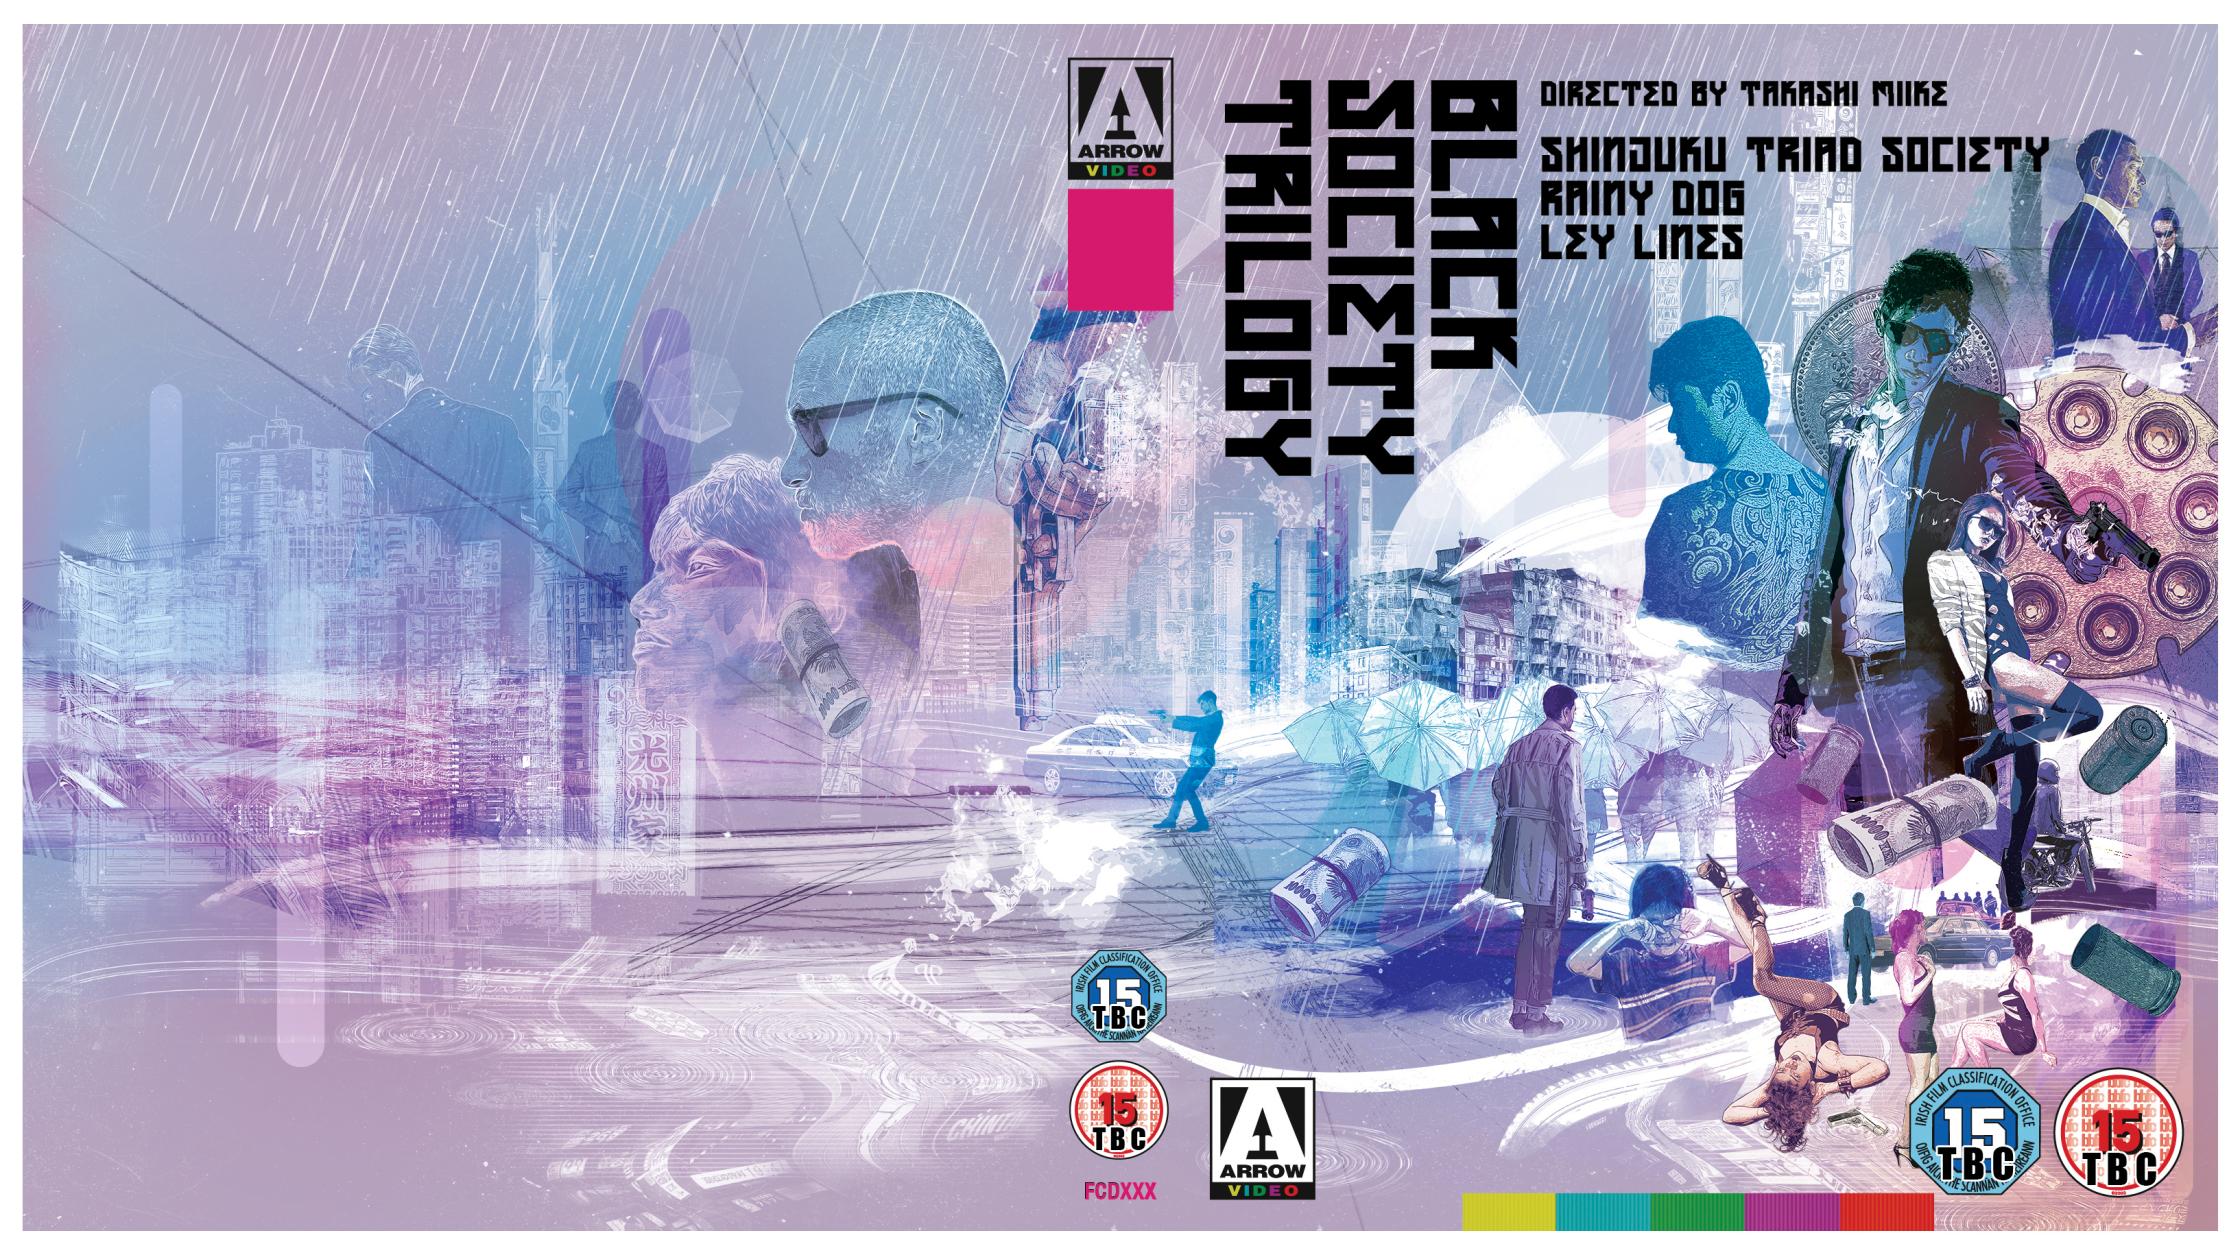 Black Society Trilogy DVD _ Arrow Video.jpg